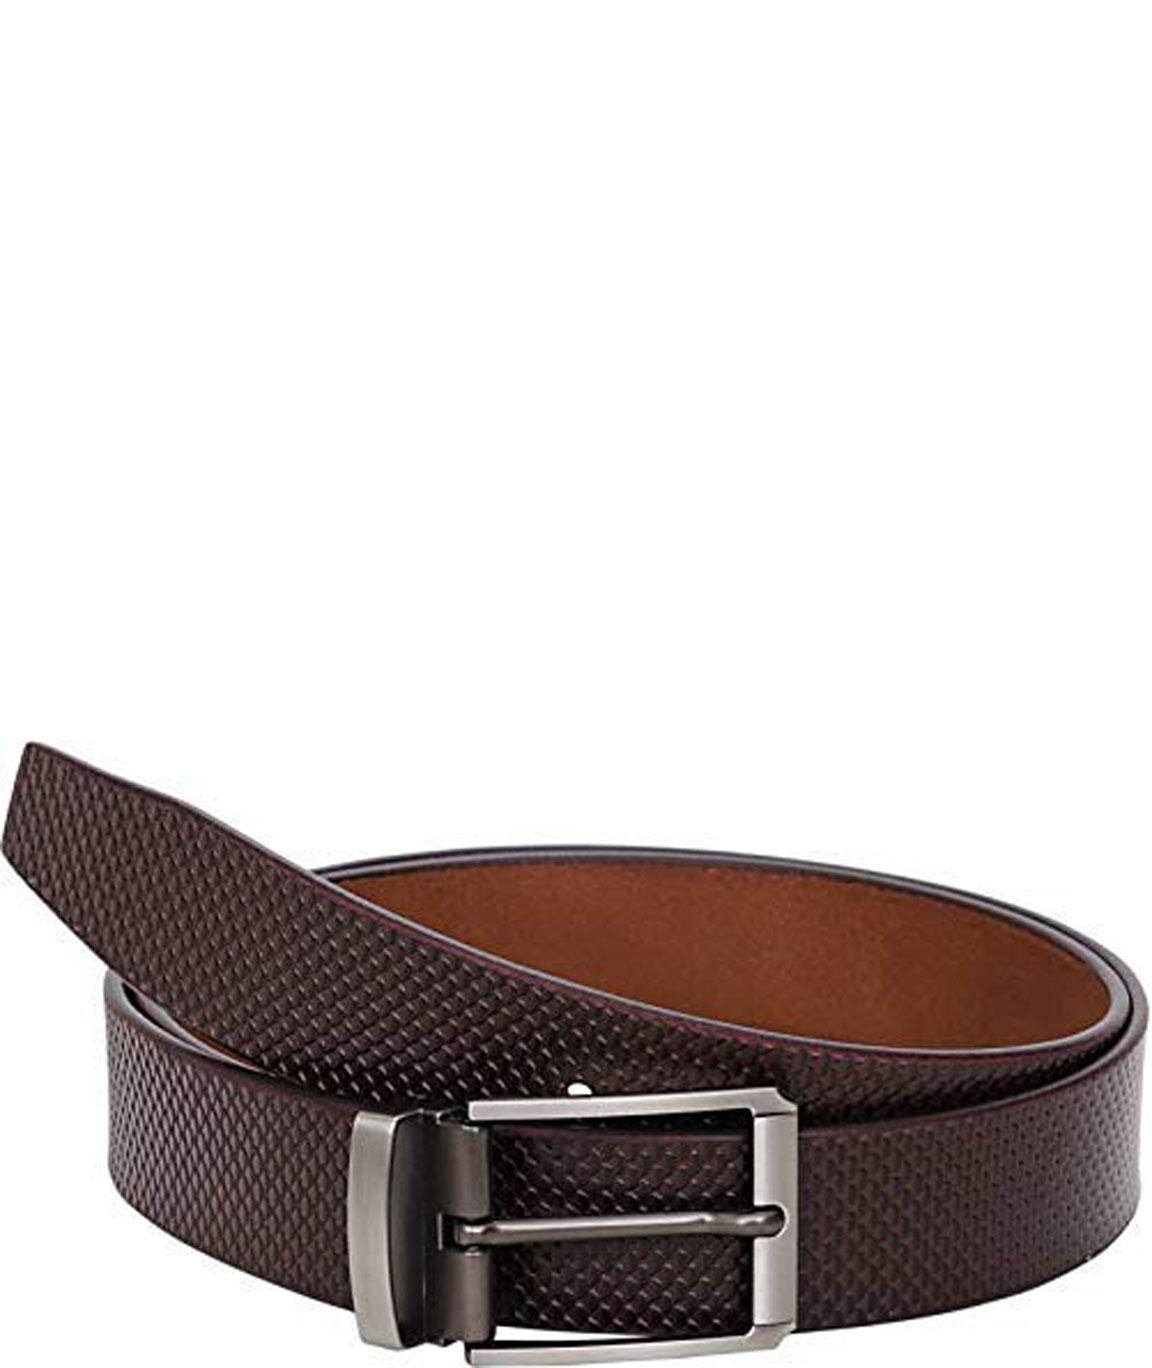 ZORO Men`s Genuine Leather Black Belt-1 Year Money back Guarantee-belts for mens-leather belt for men formal branded-genuine leather belt for men FSBR-09